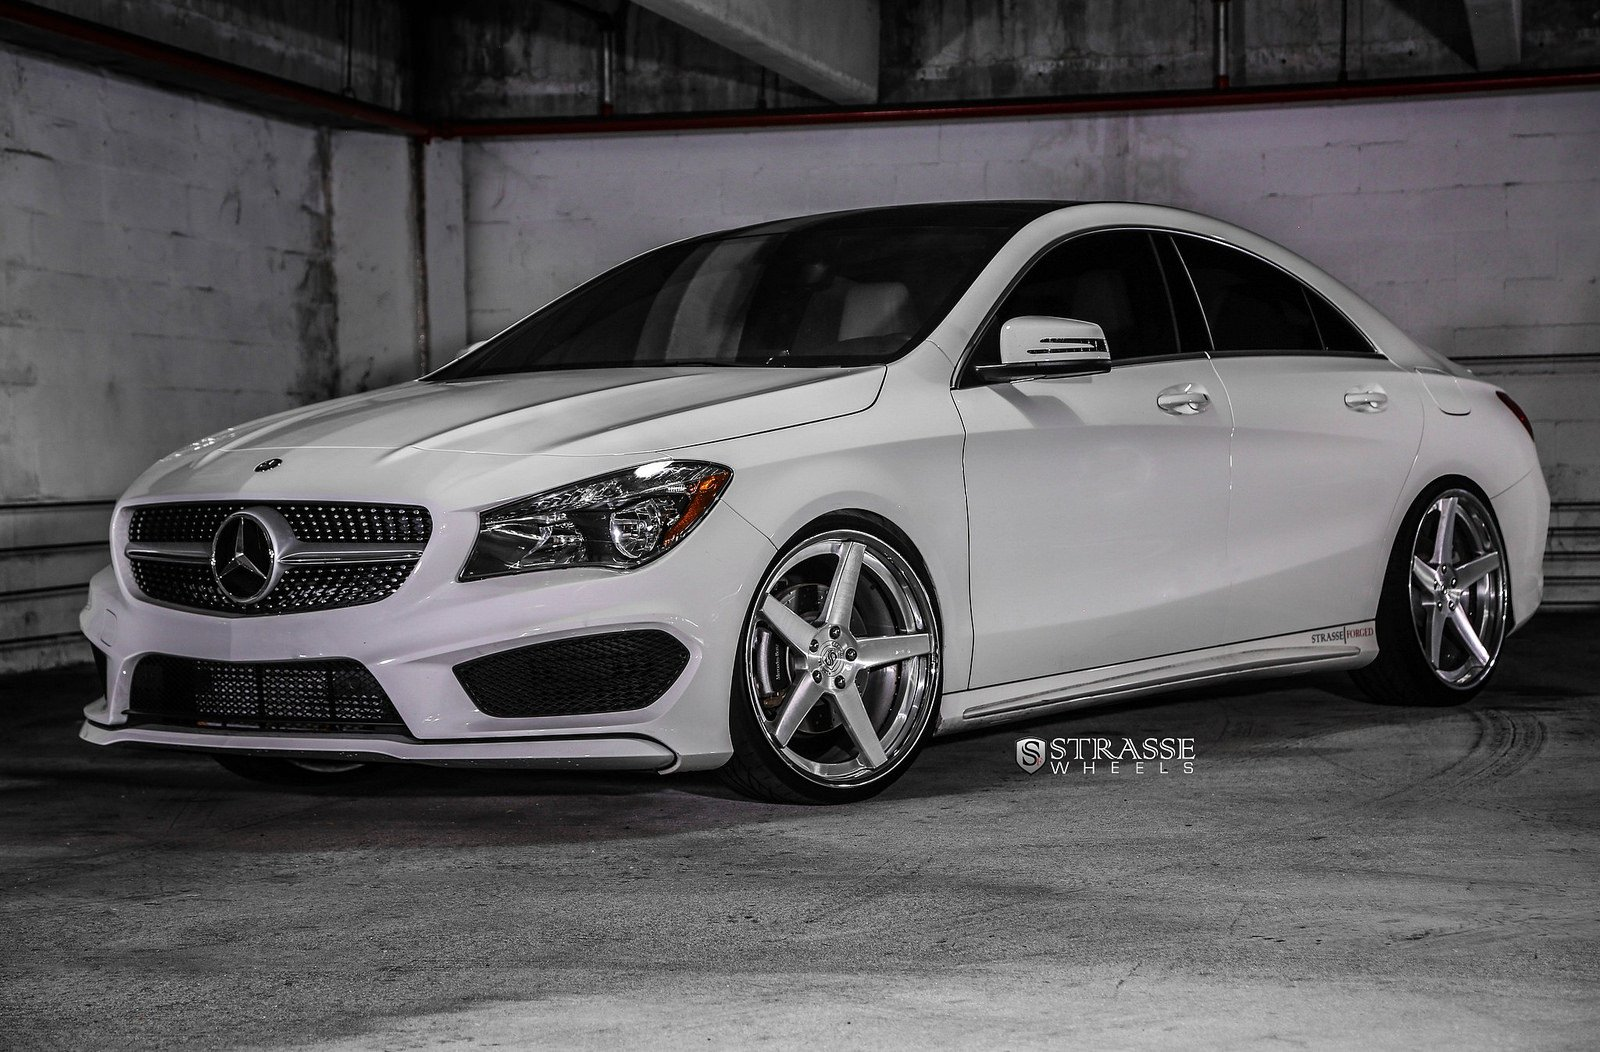 Mercedes benz cla strasse wheels tuning white wallpaper for White rims for mercedes benz